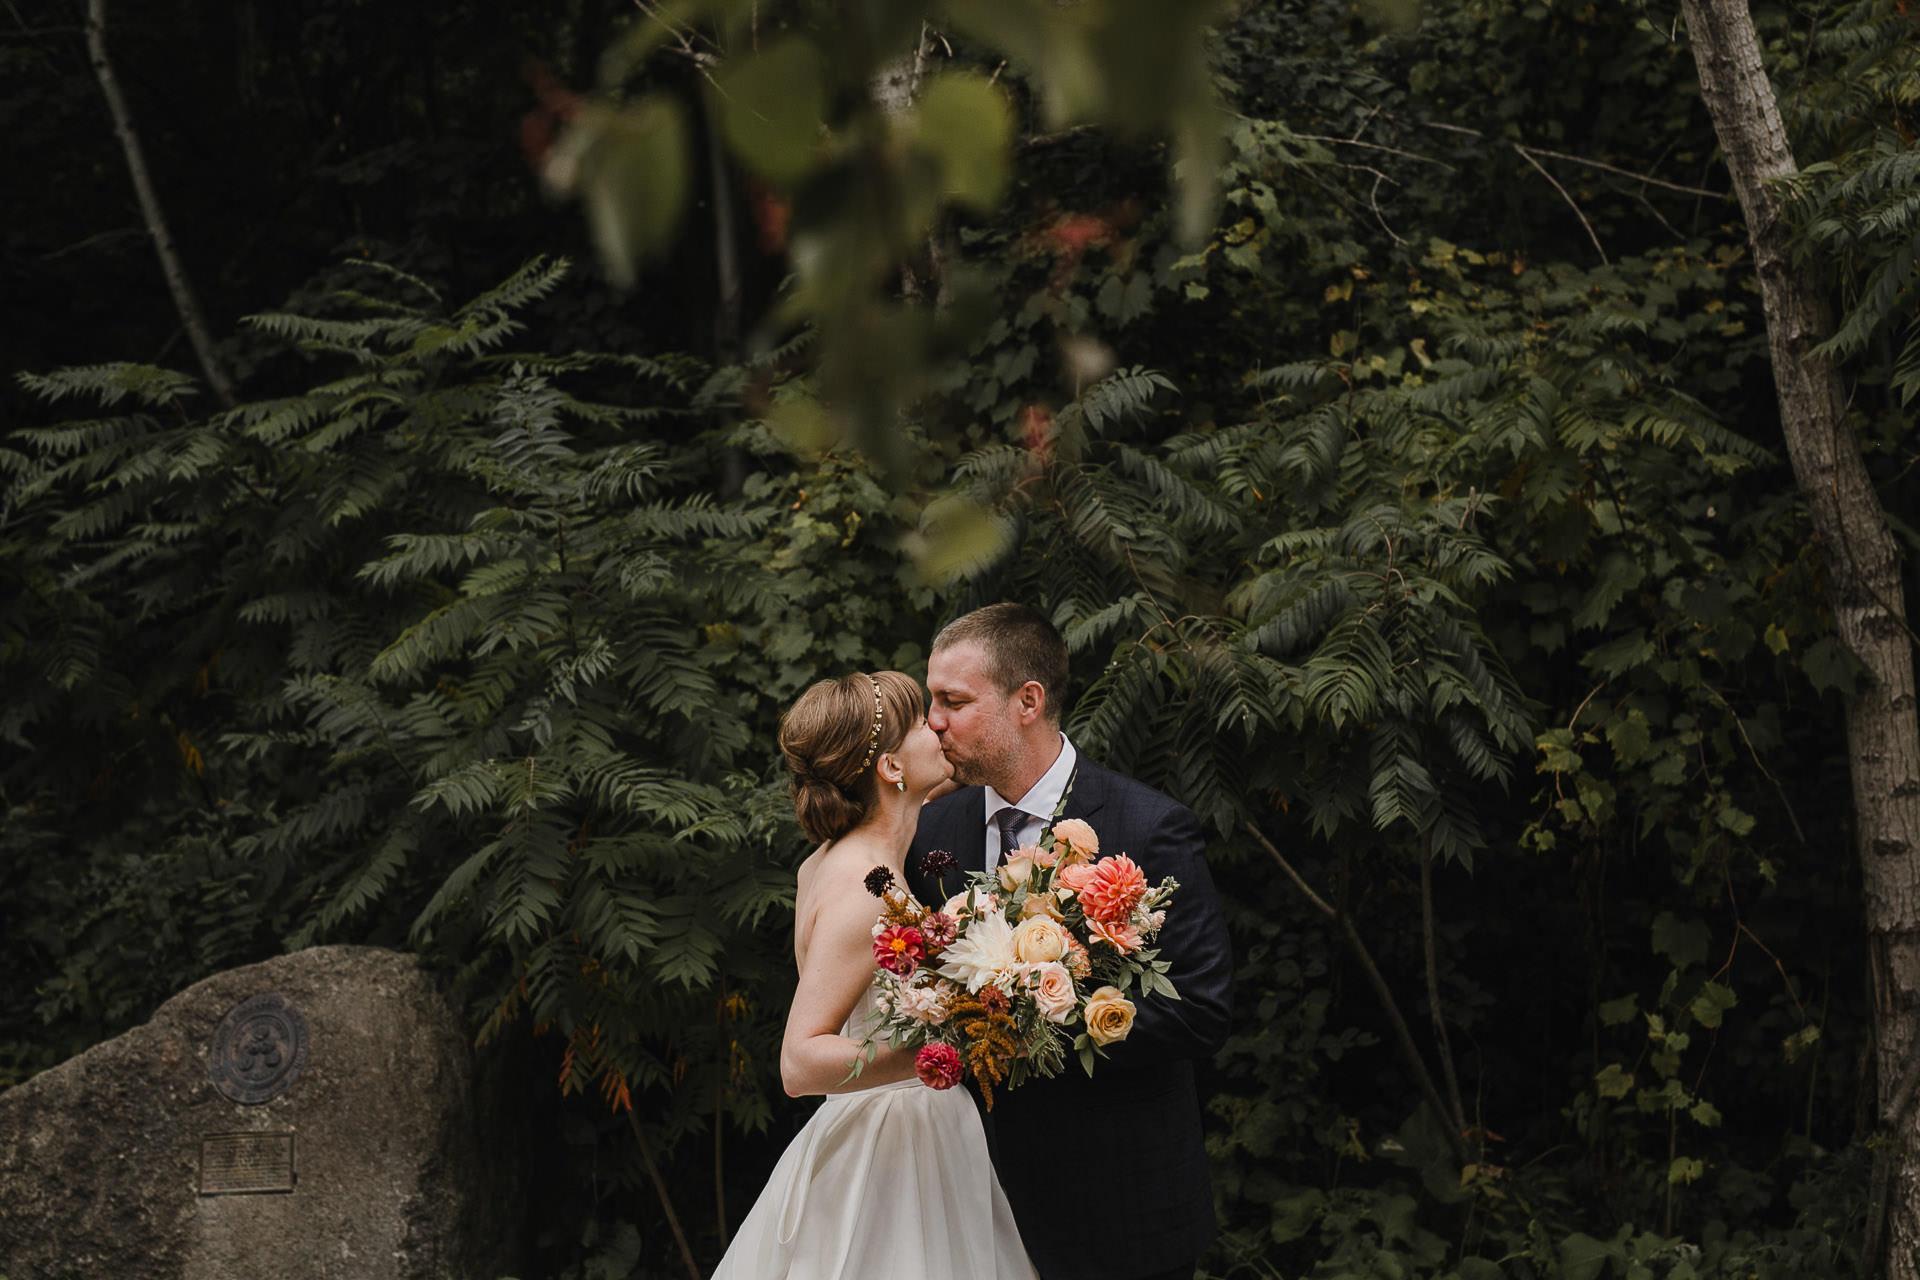 Evergreen Brickworks wedding photographer - first look kiss